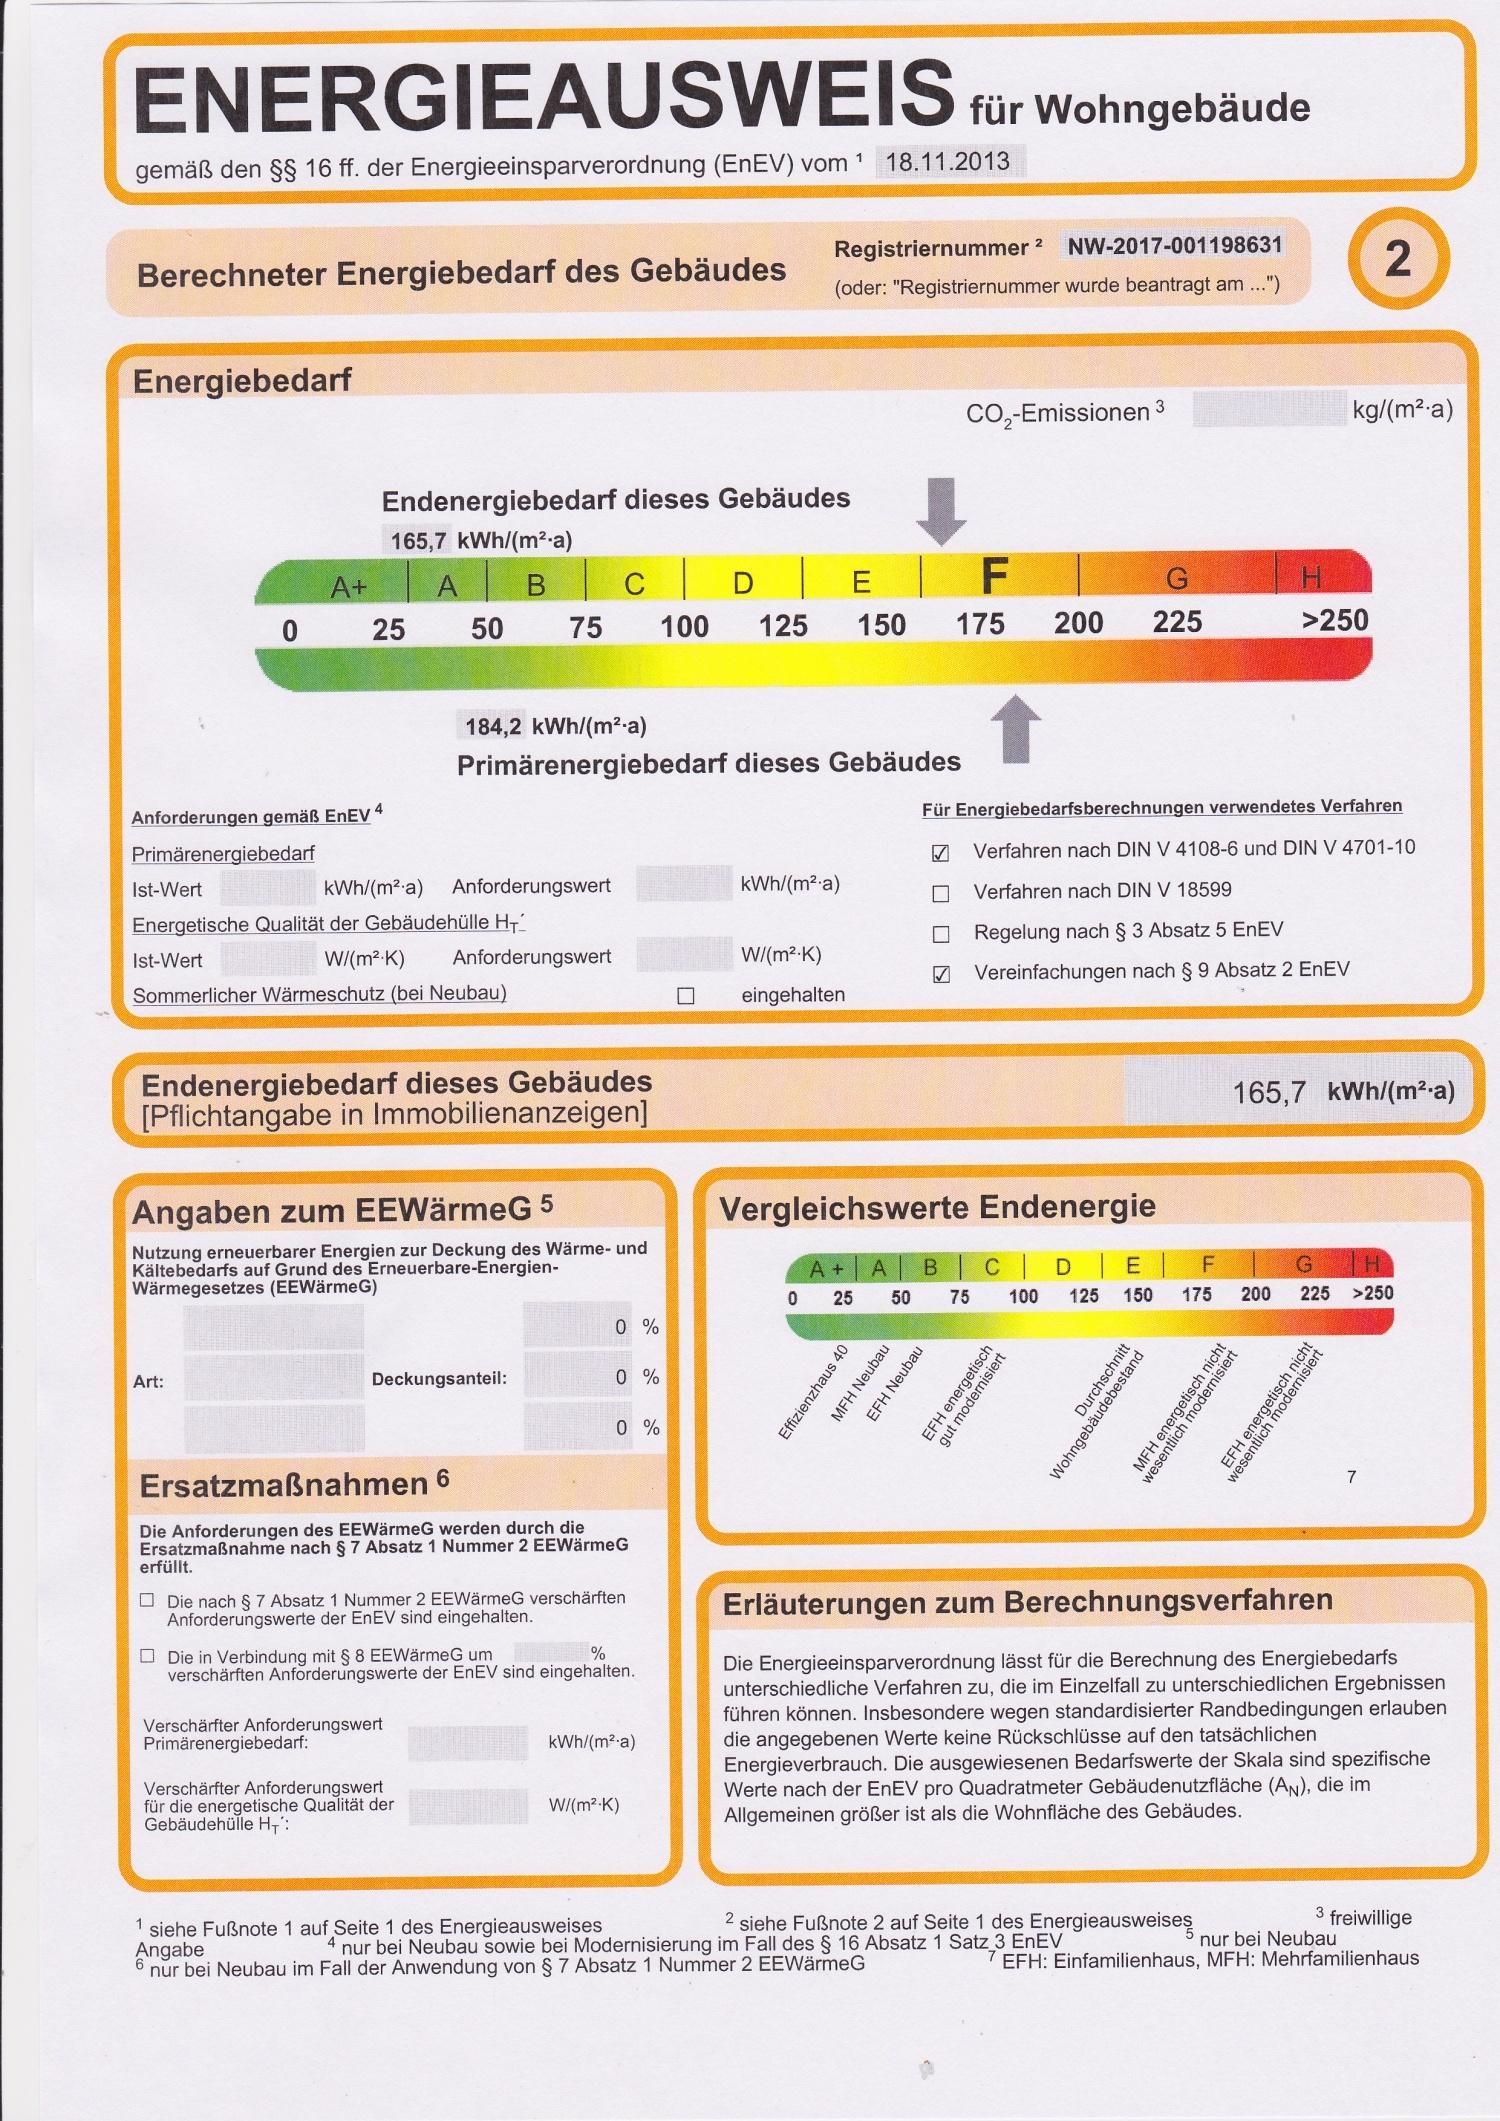 Energieausweis 2